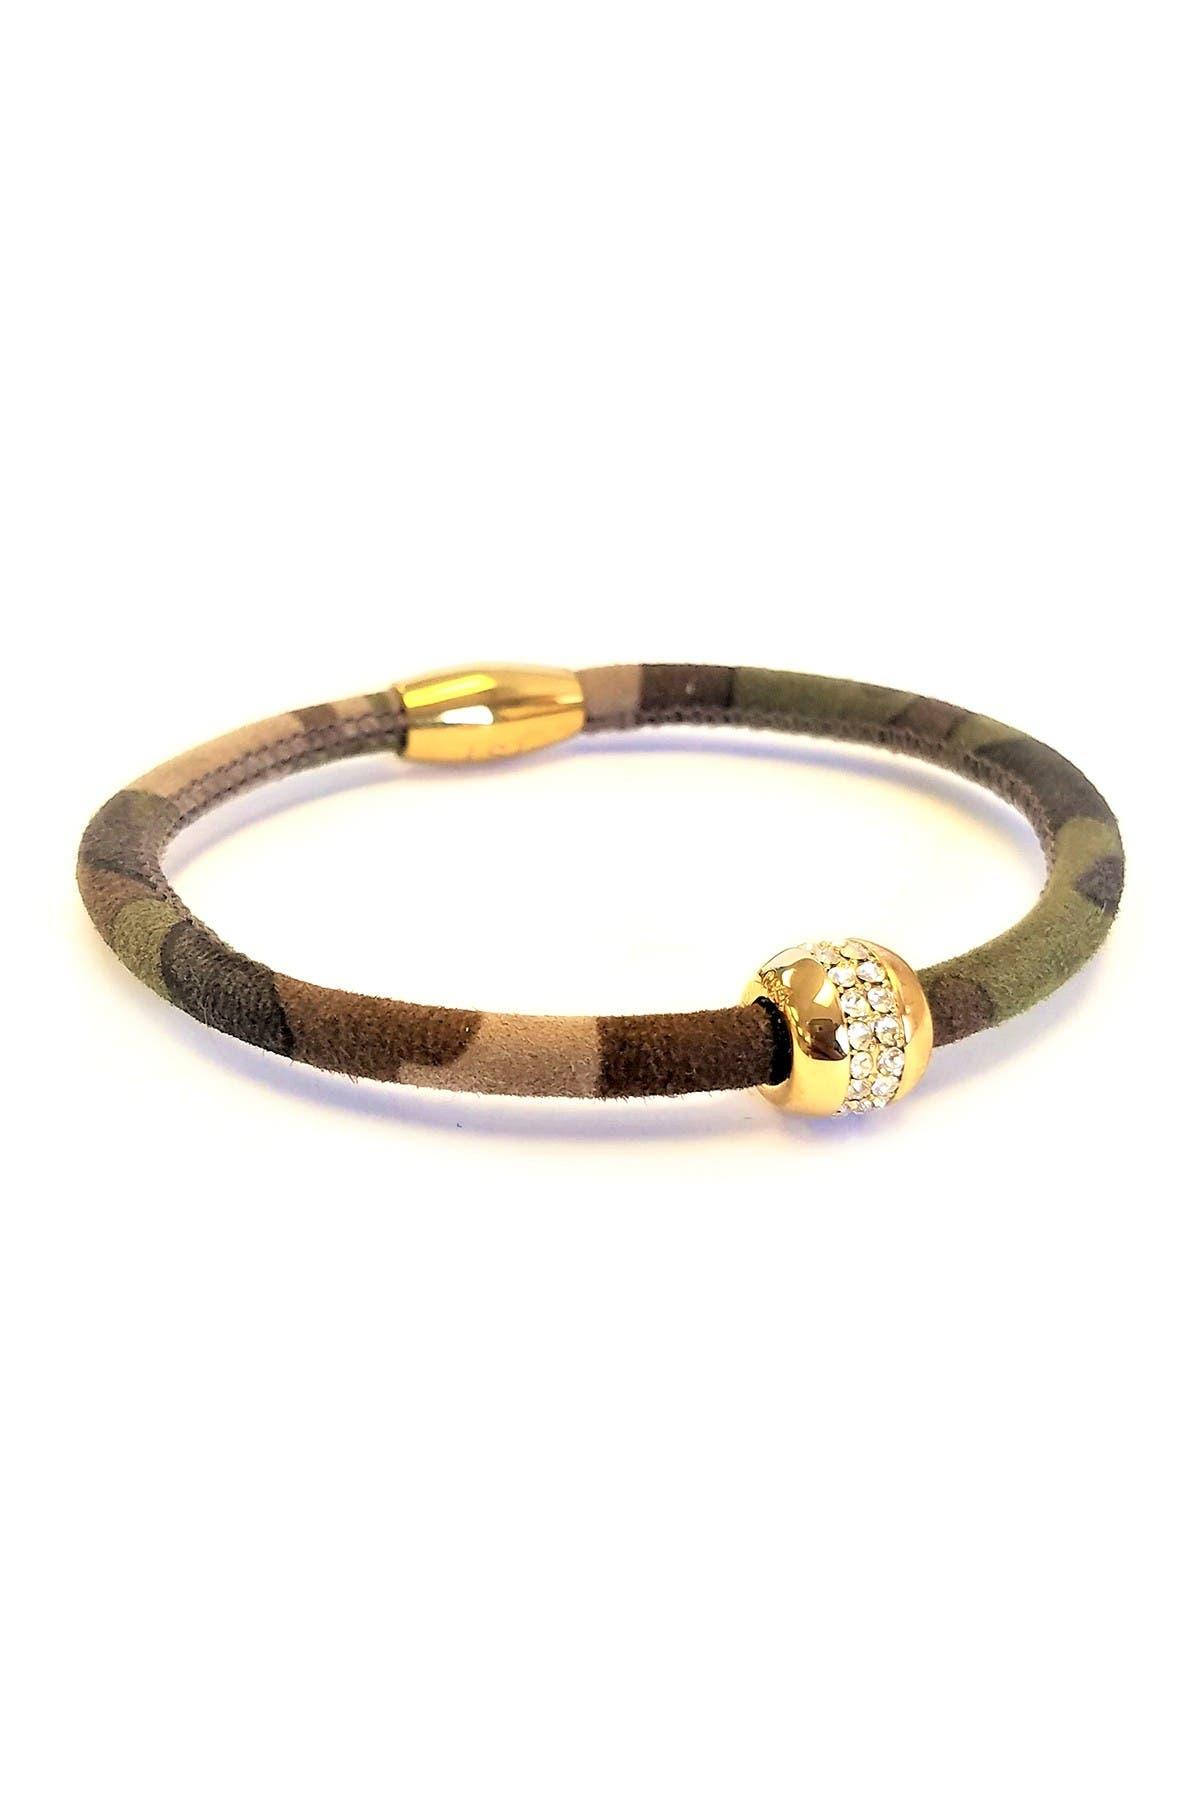 Image of Liza Schwartz Good Karma Camouflage Premium Leather Bracelet